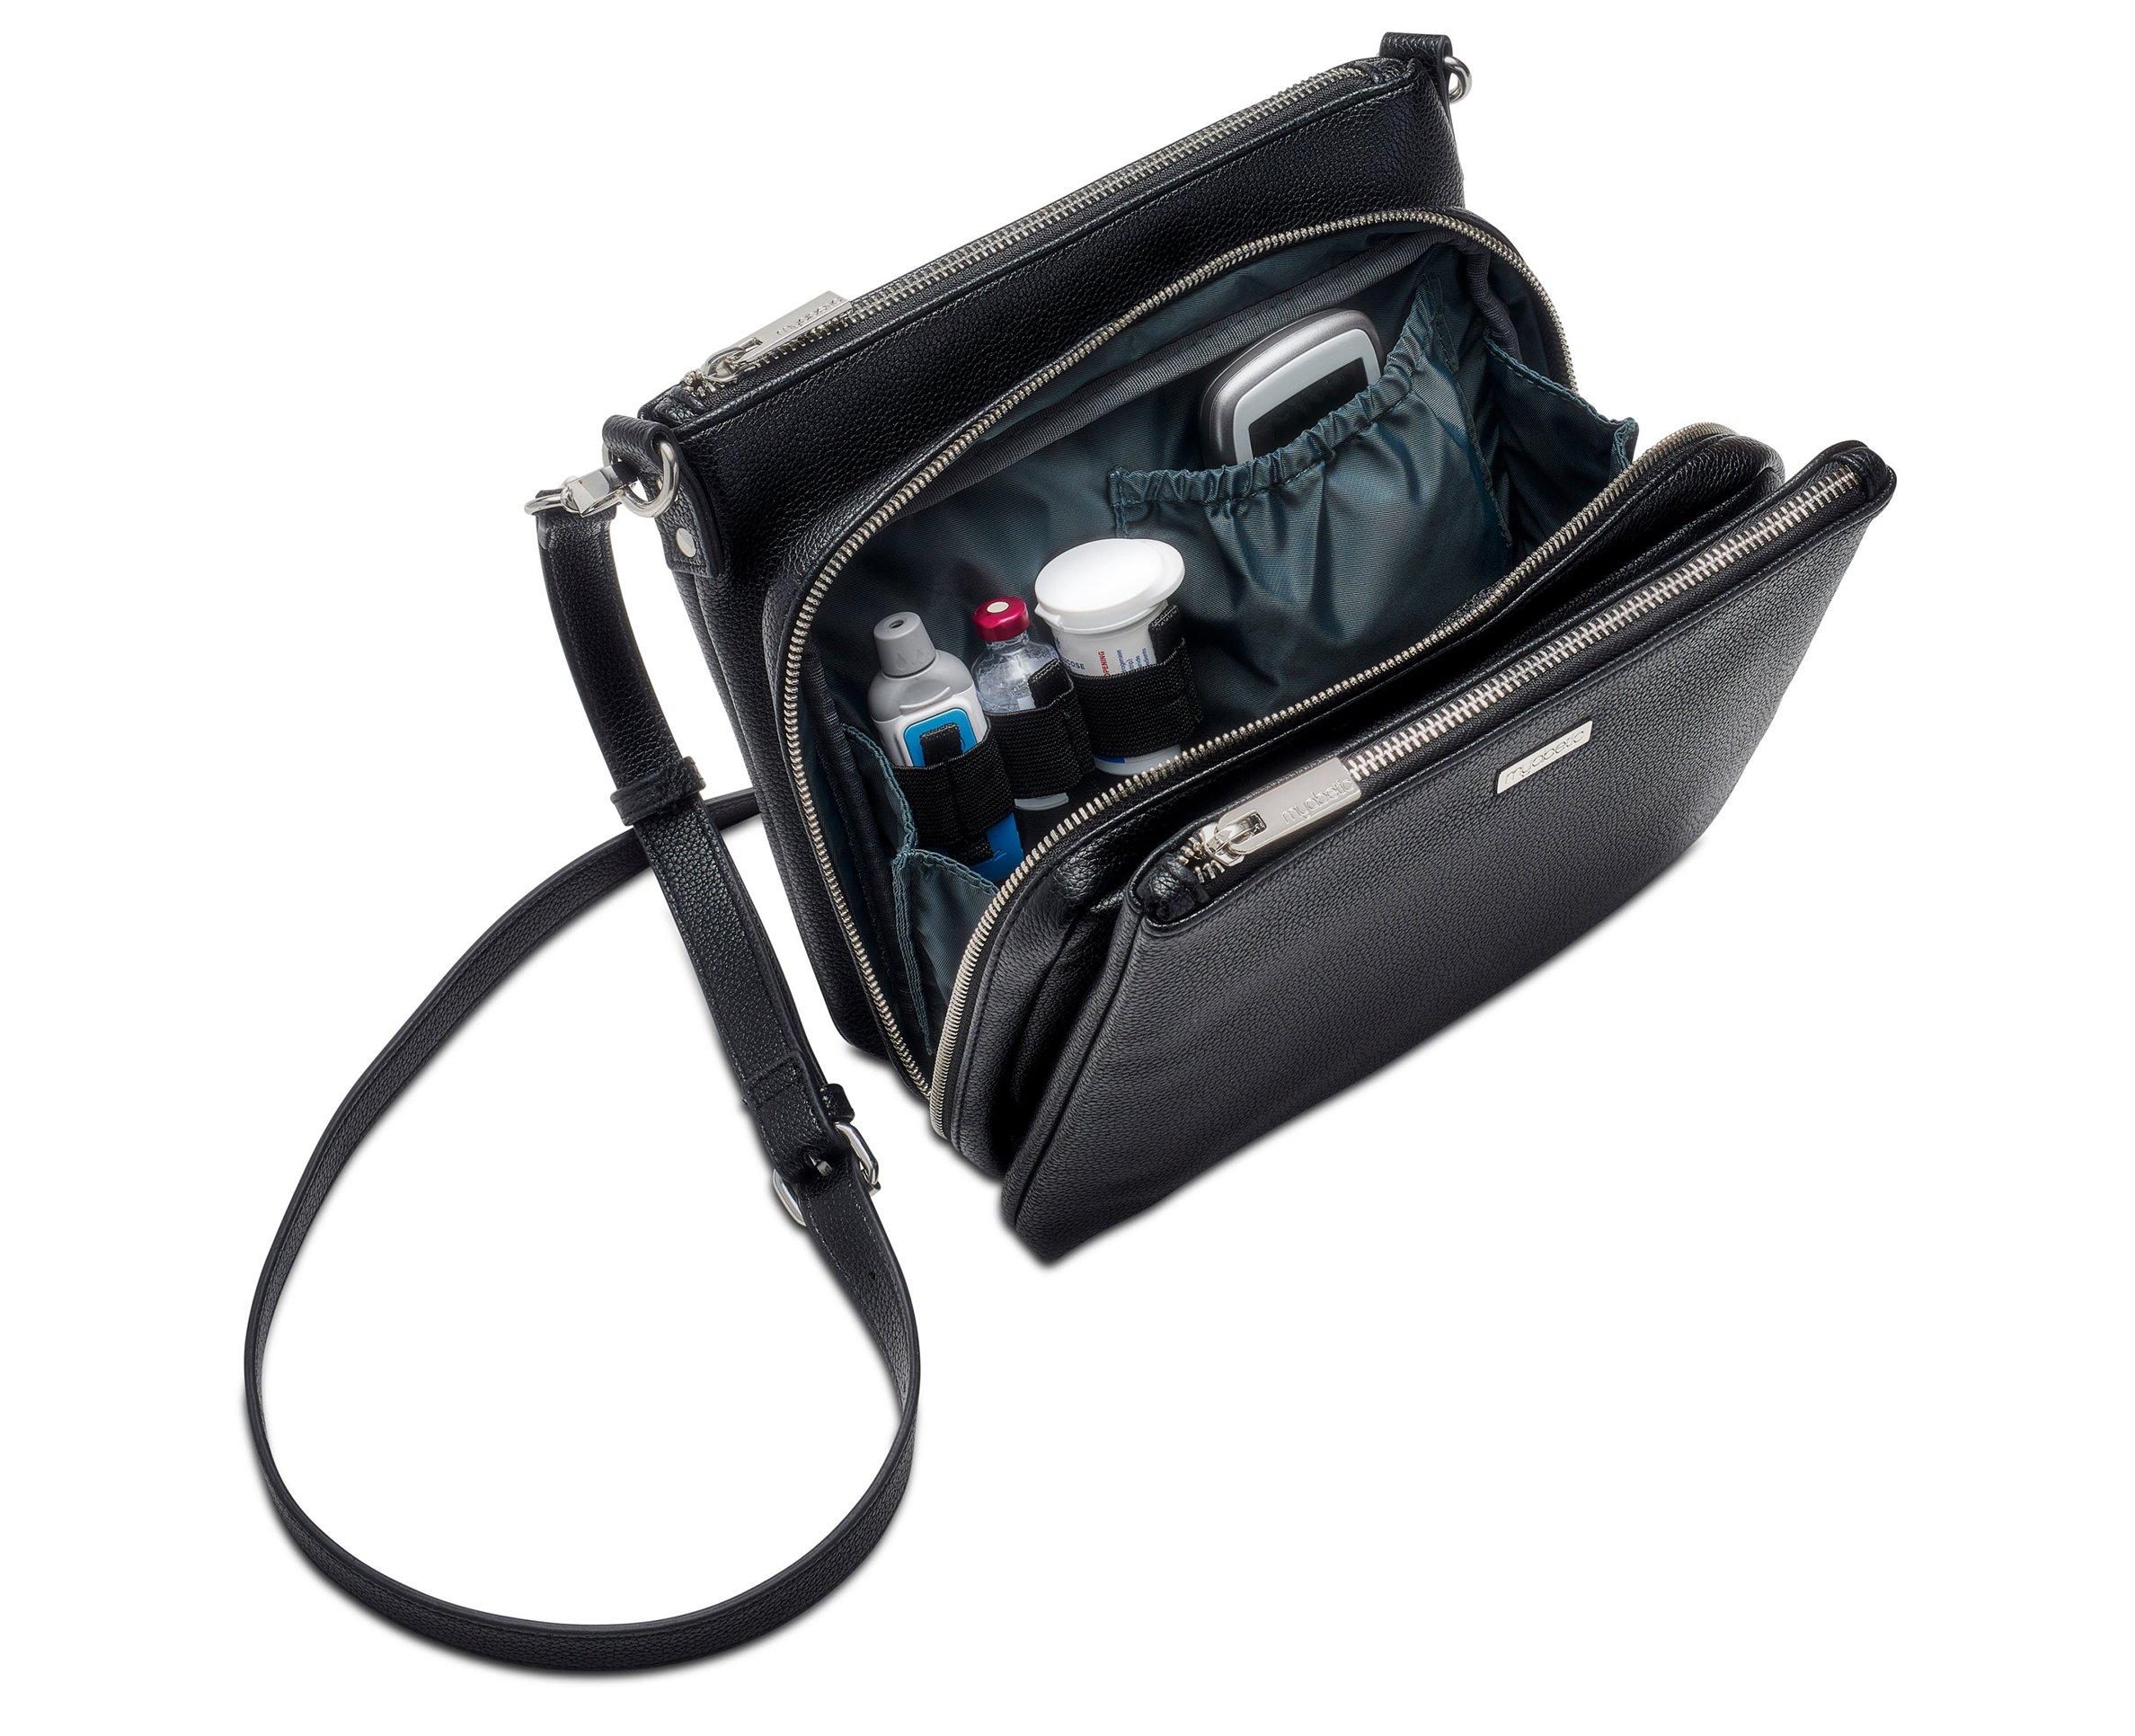 Myabetic Cherise Diabetes Handbag for Glucose Monitoring System, Insulin Pens, Insulin Vials, Test Strips, etc (Black) by Myabetic (Image #4)